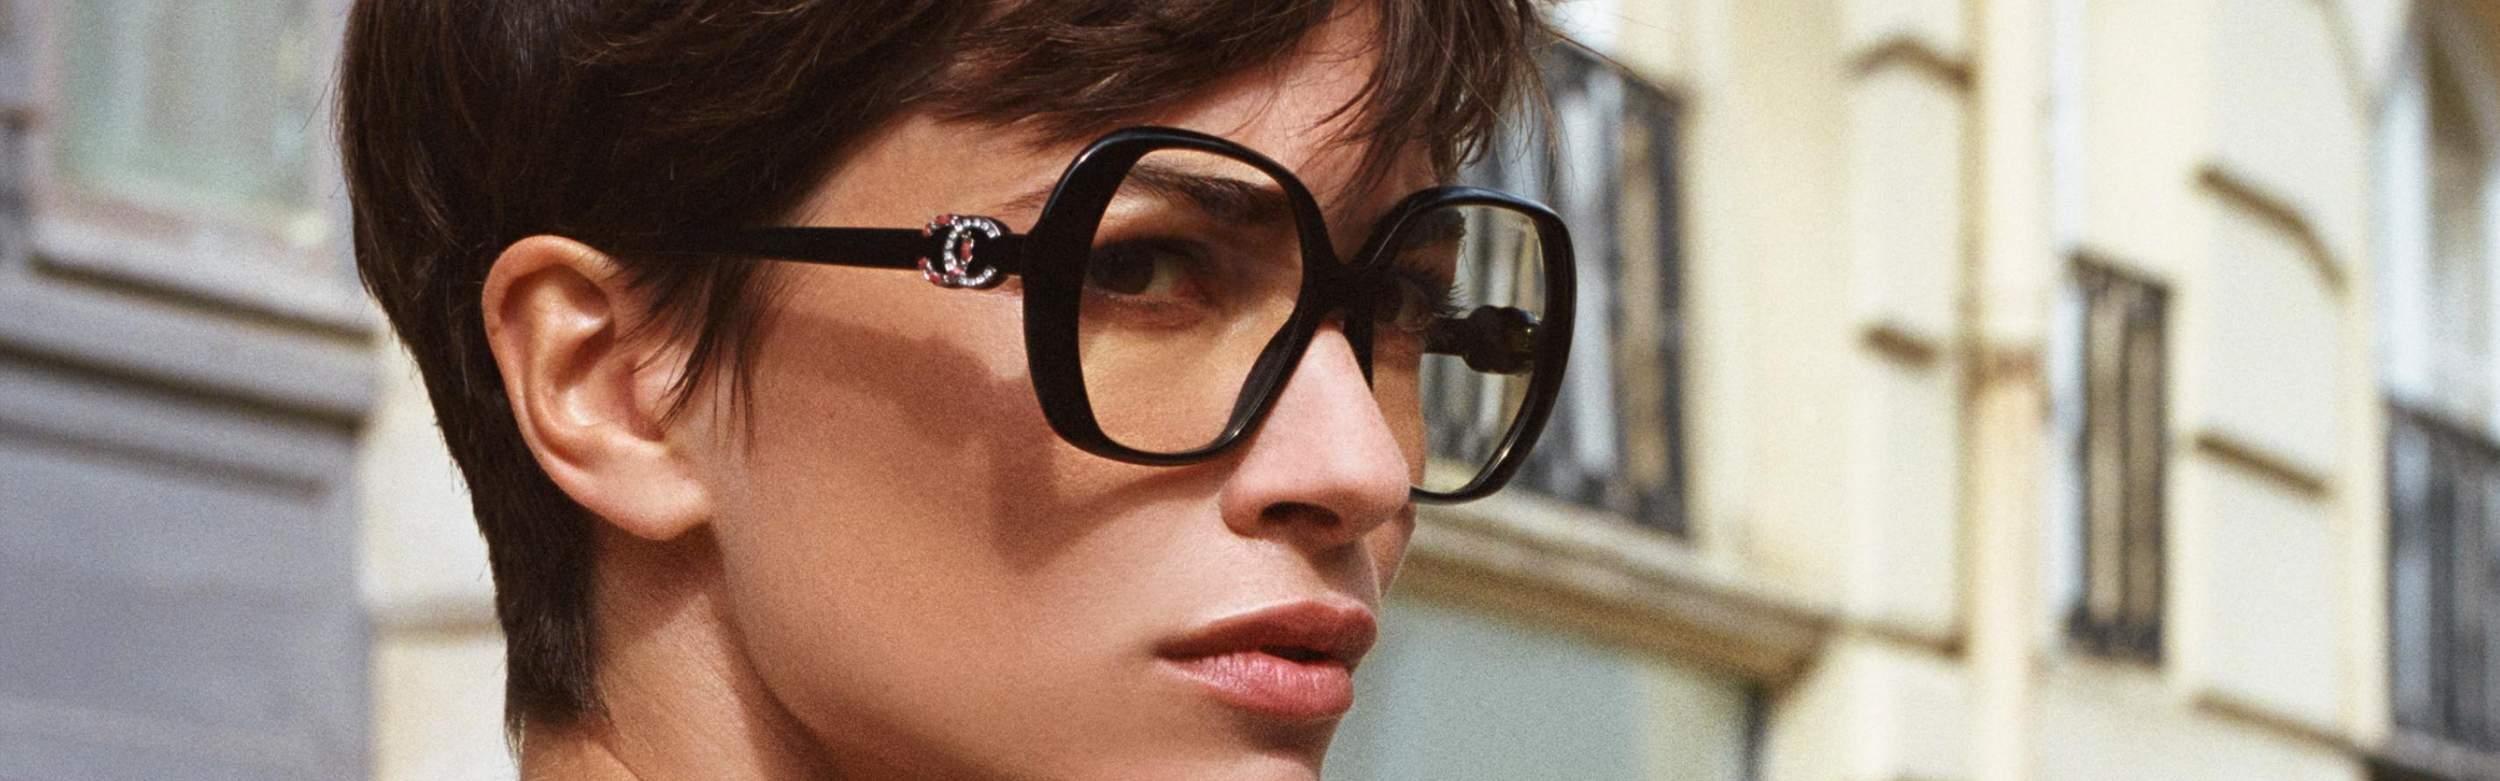 Chanel Eyeglasses 2020 & 2021